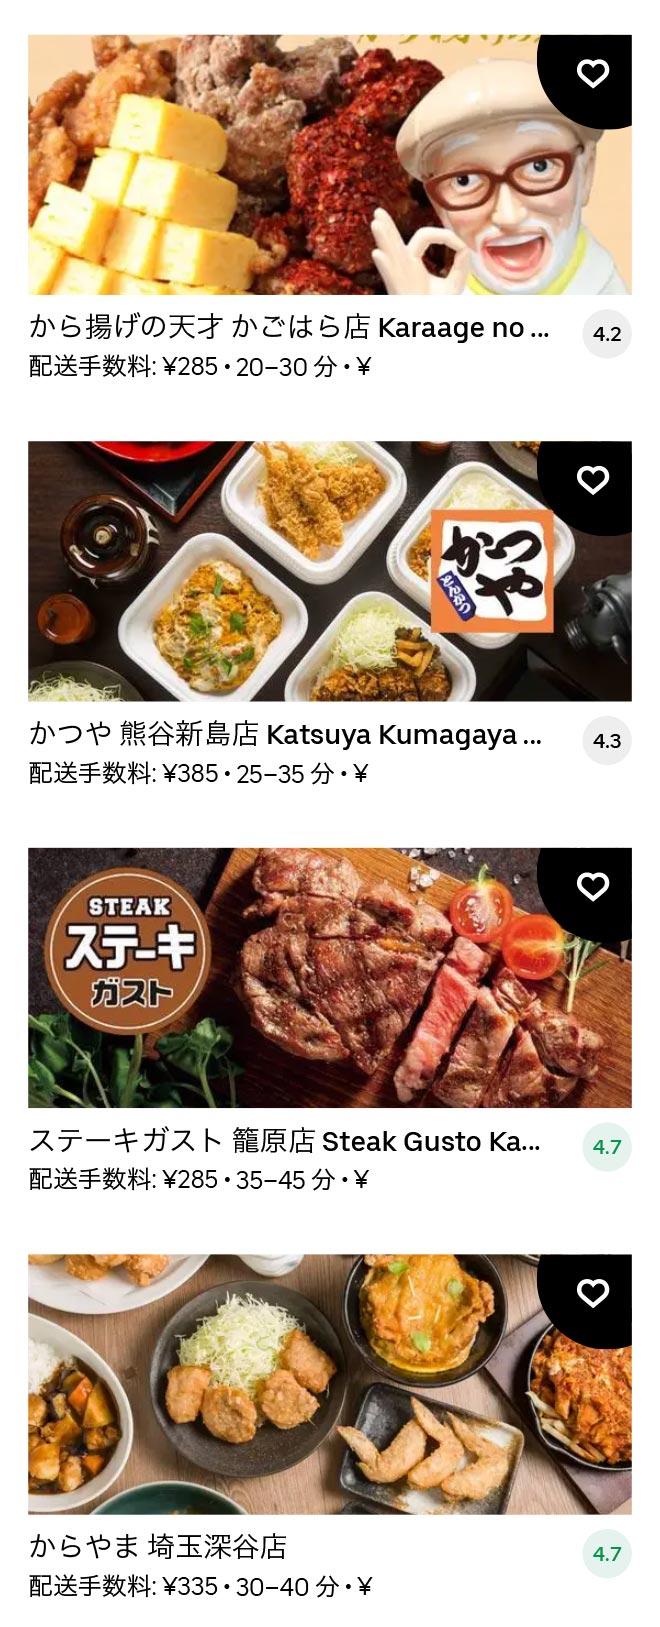 Kagohara menu 2101 03